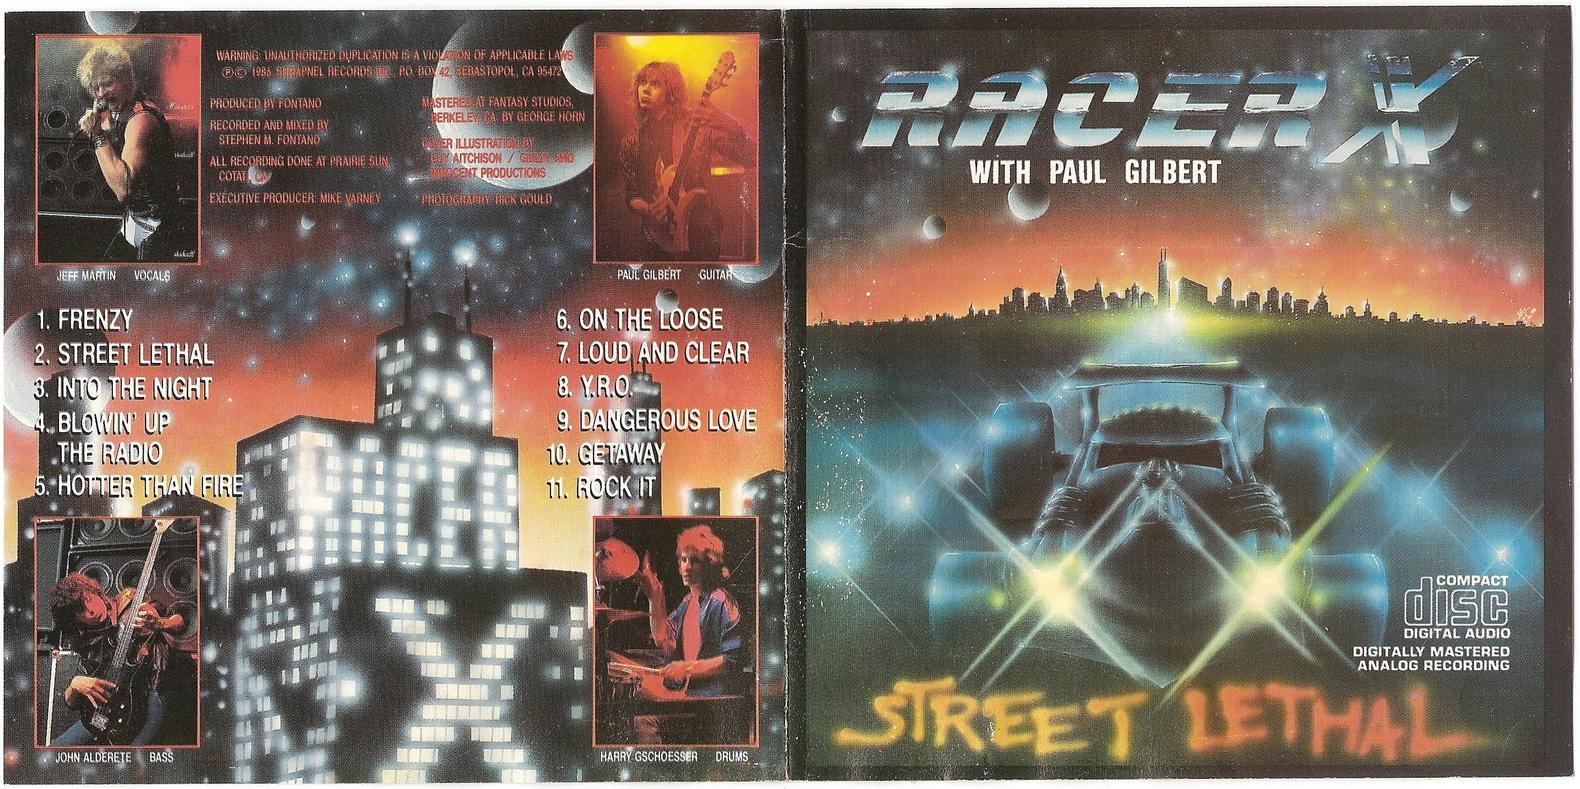 Racer X Street Legal